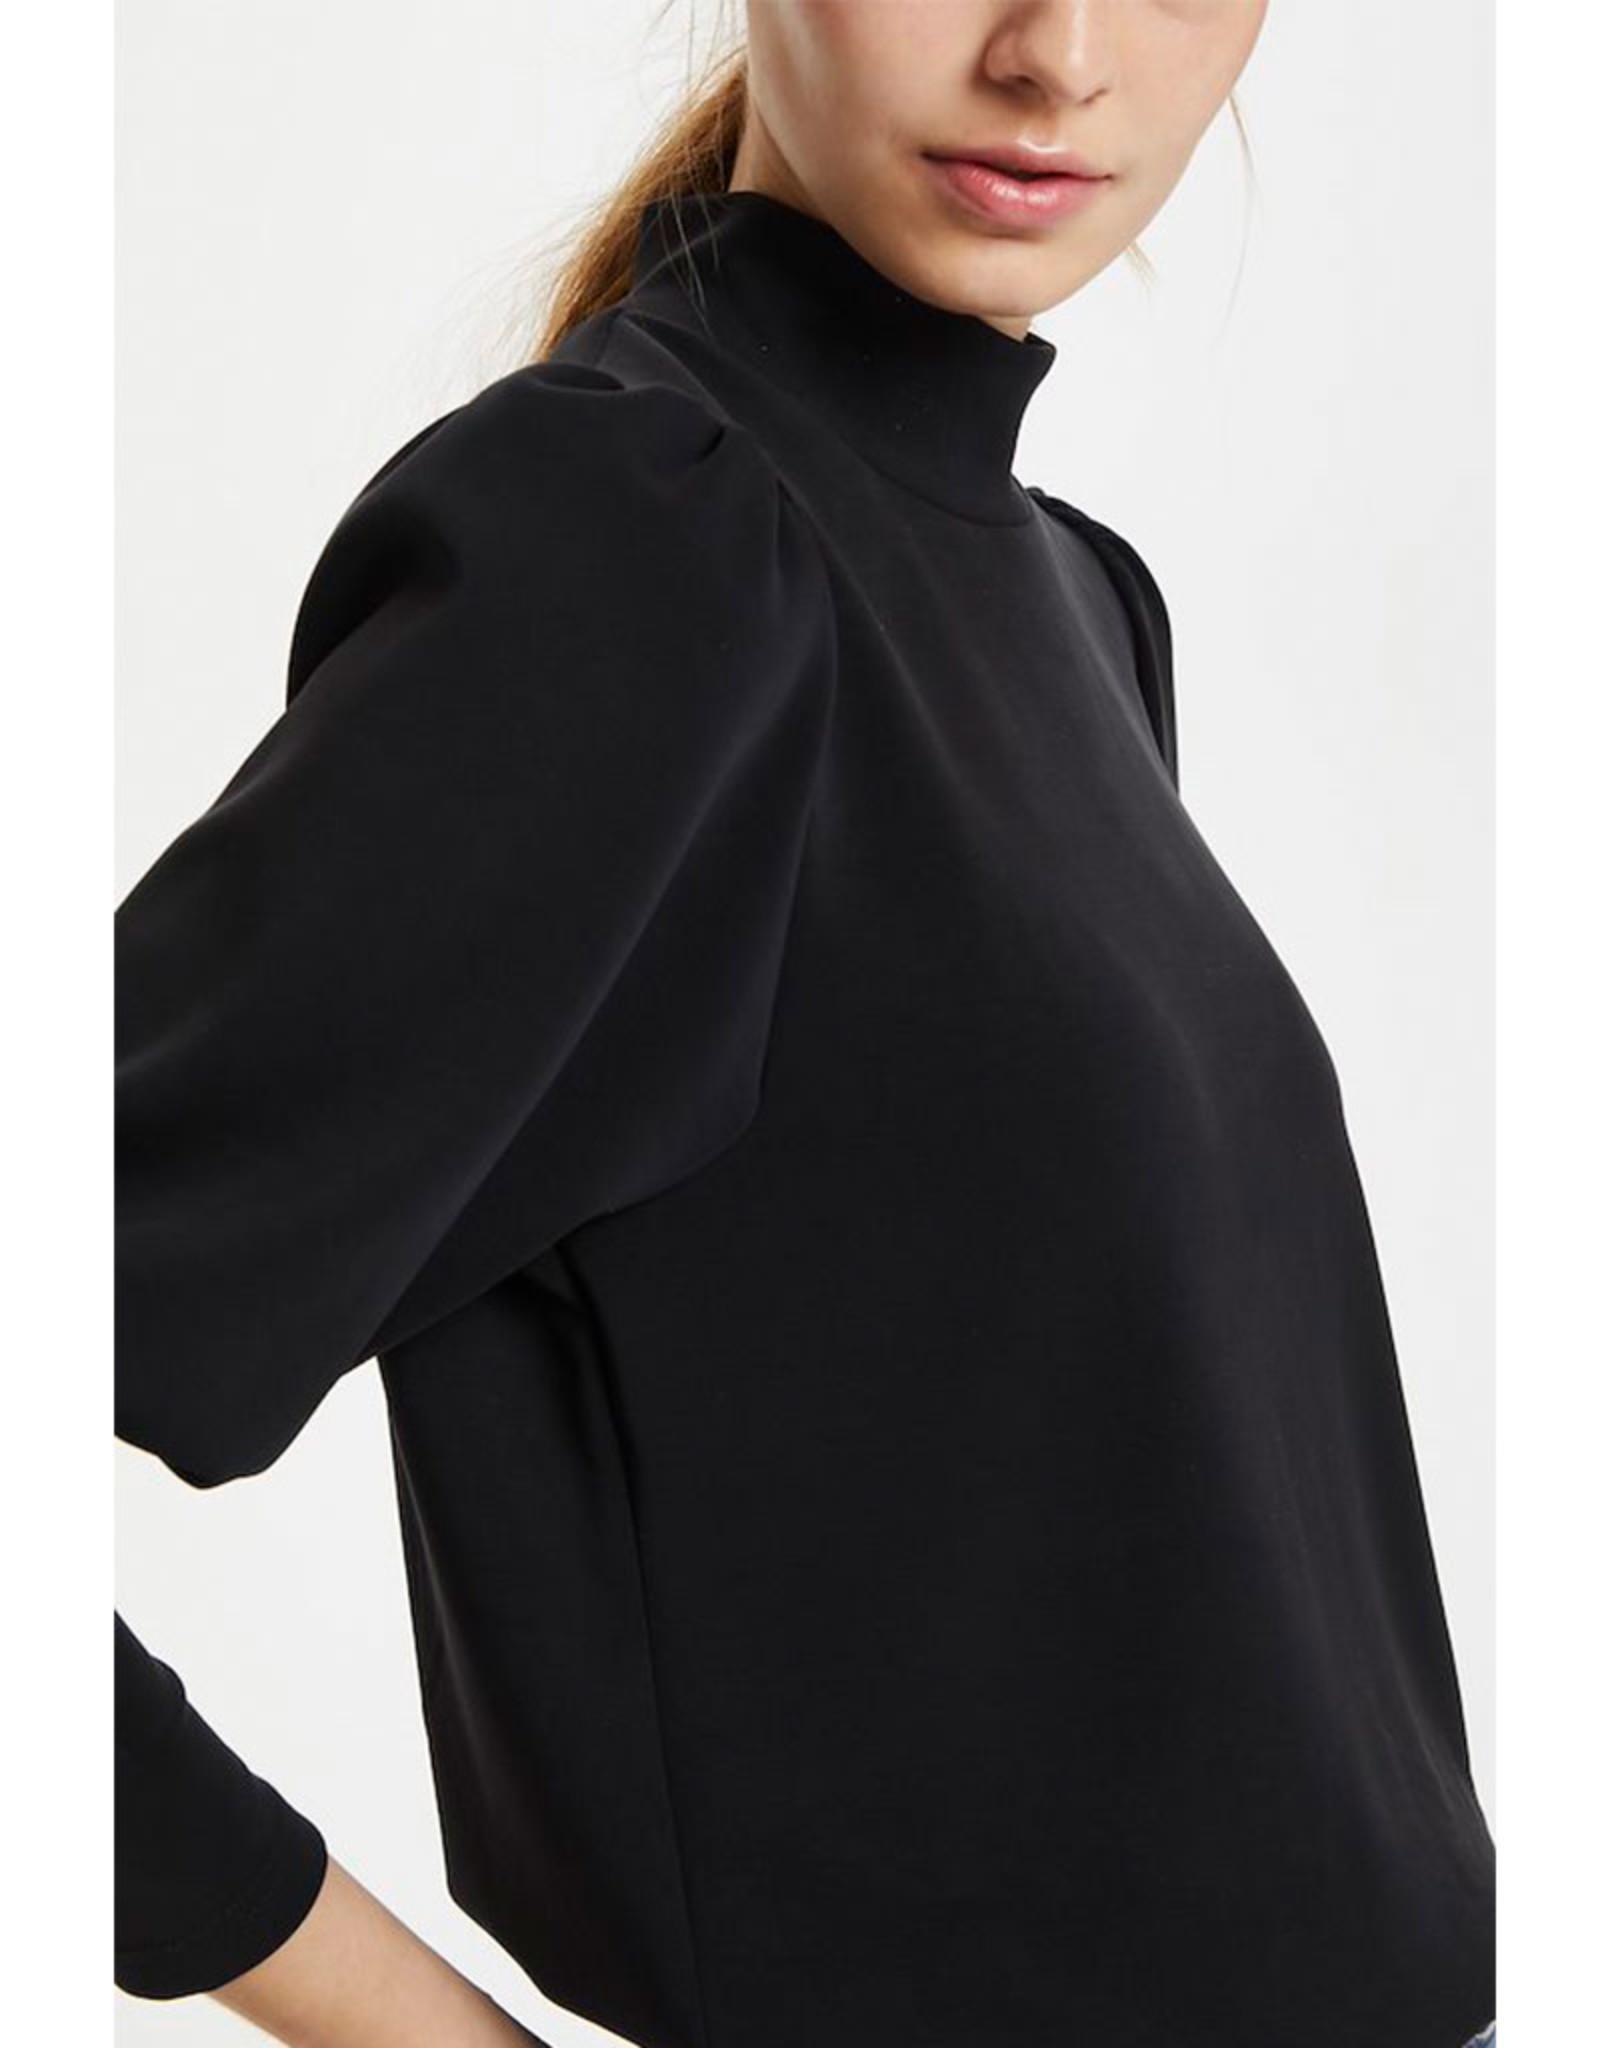 My Essential Wardrobe Elle Puff Blouse